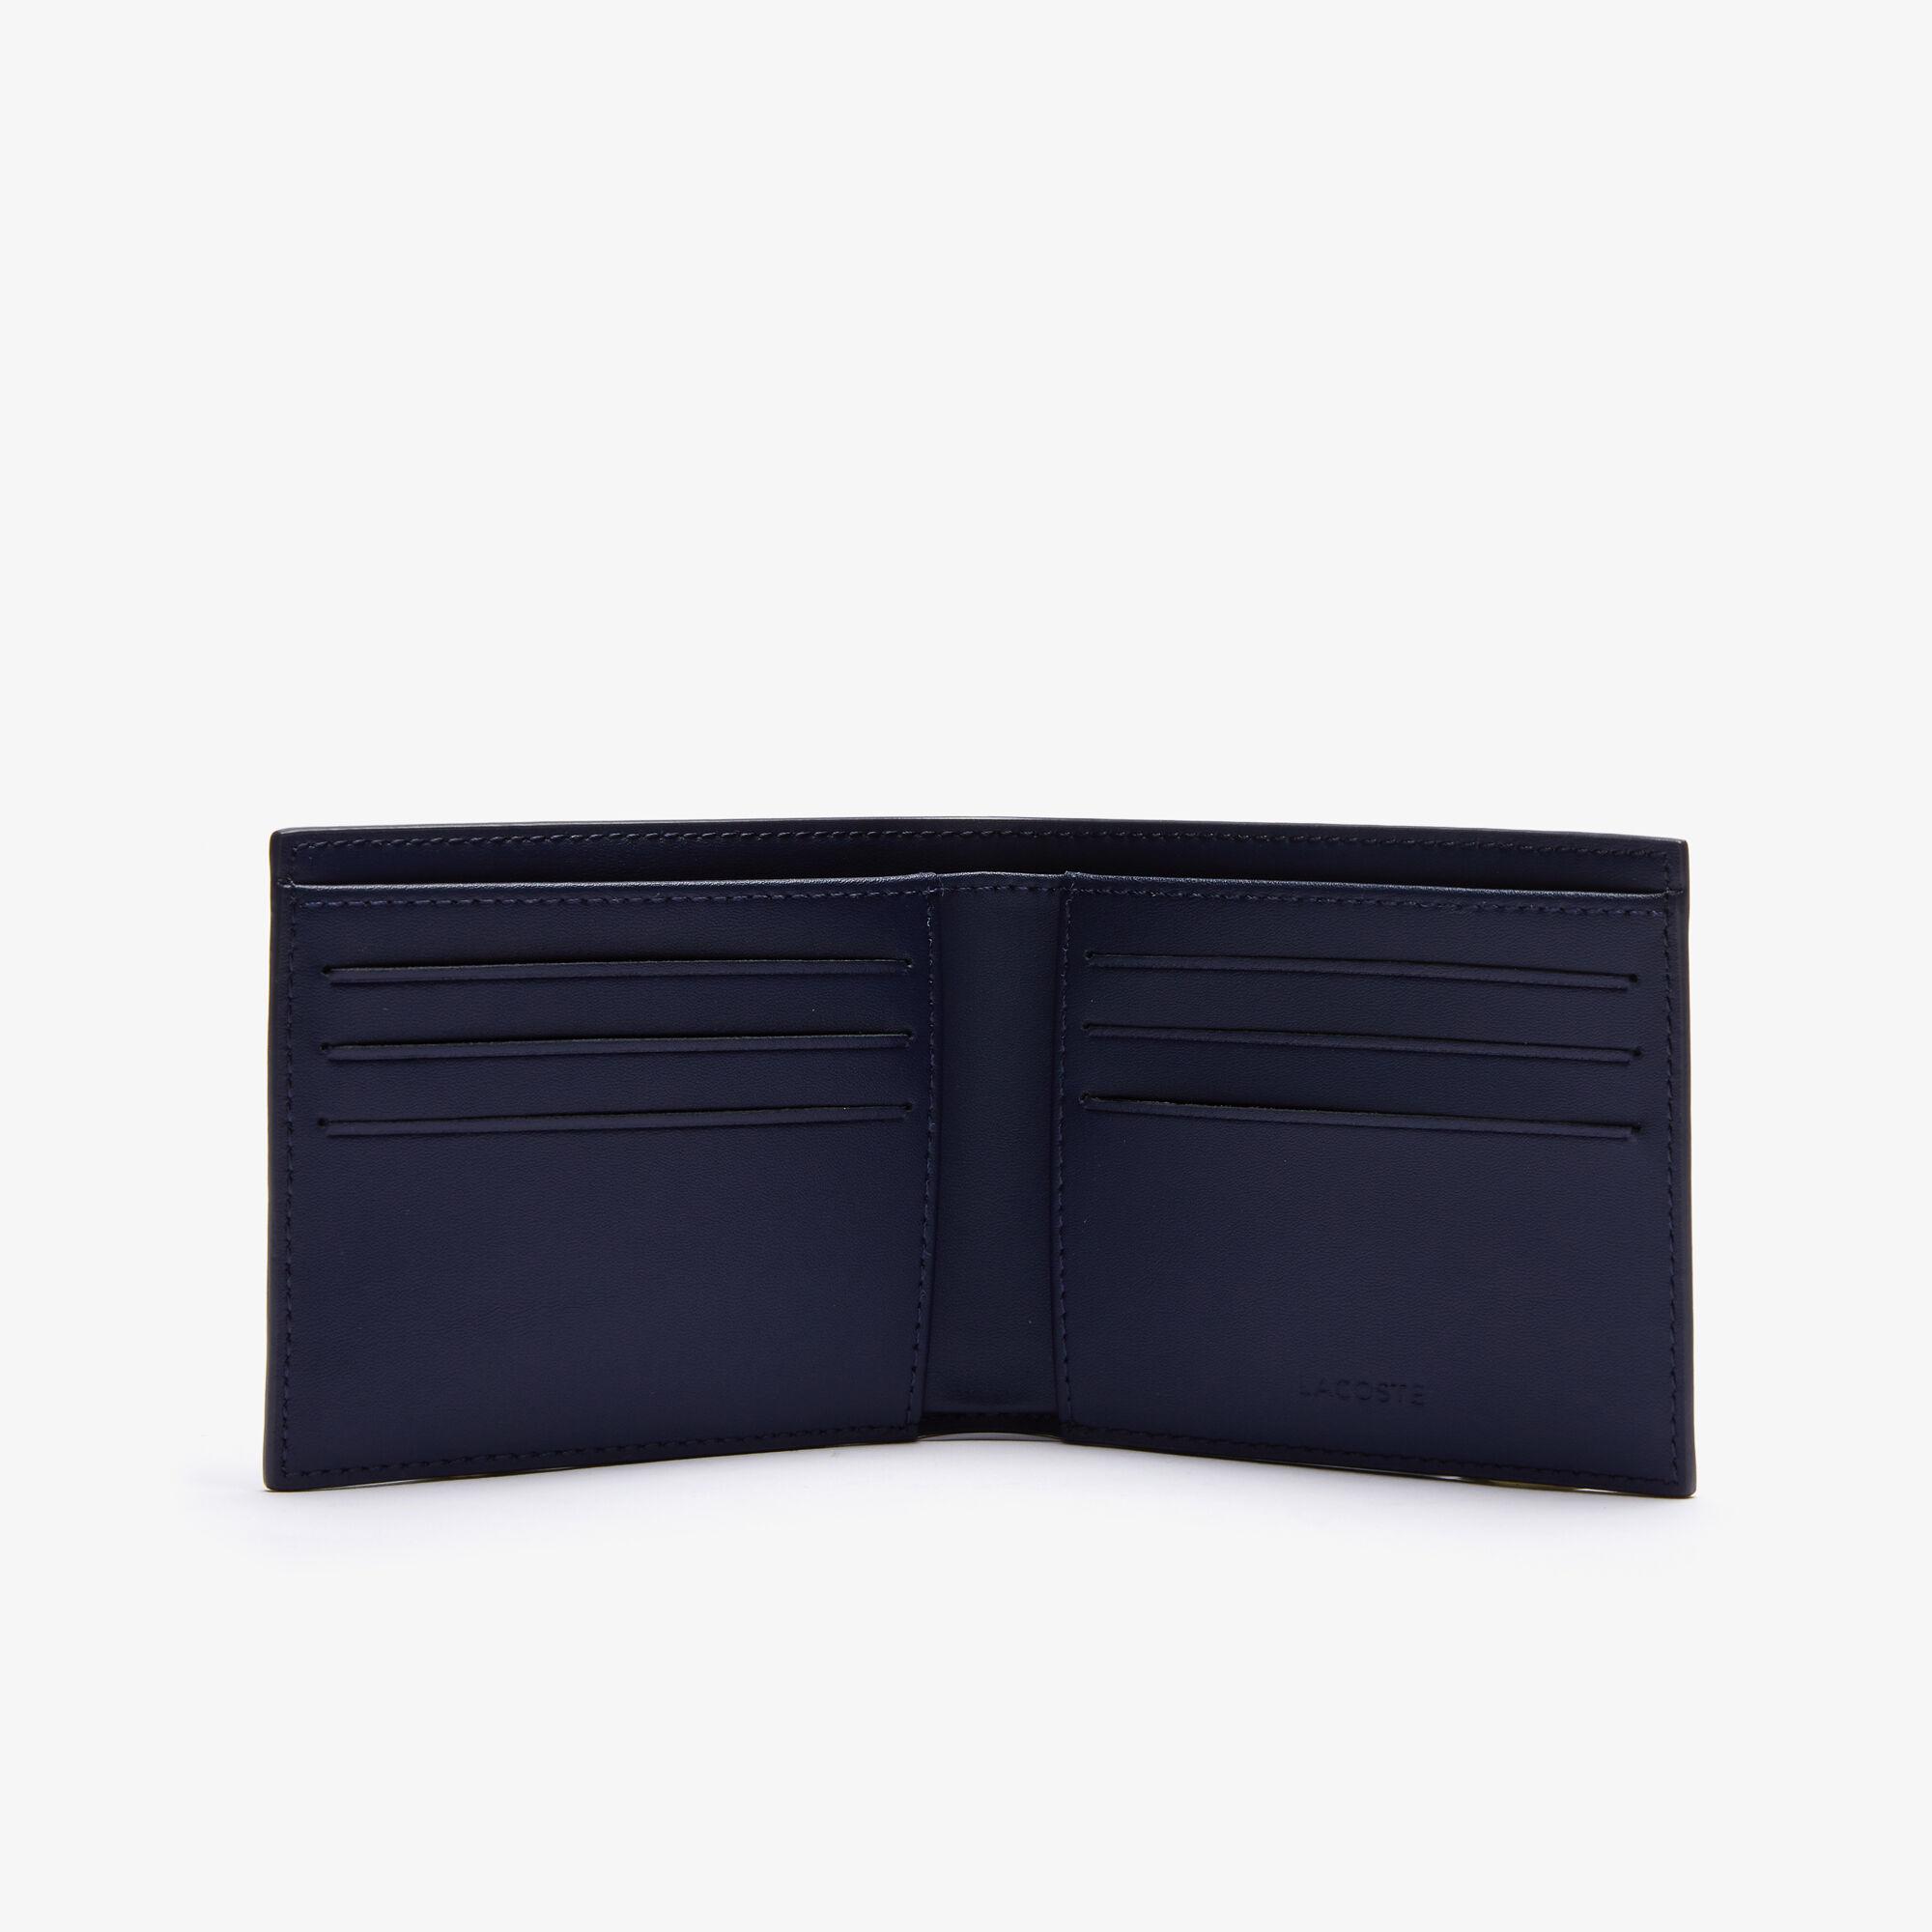 Men's Urban Breathe Smooth Leather Wallet